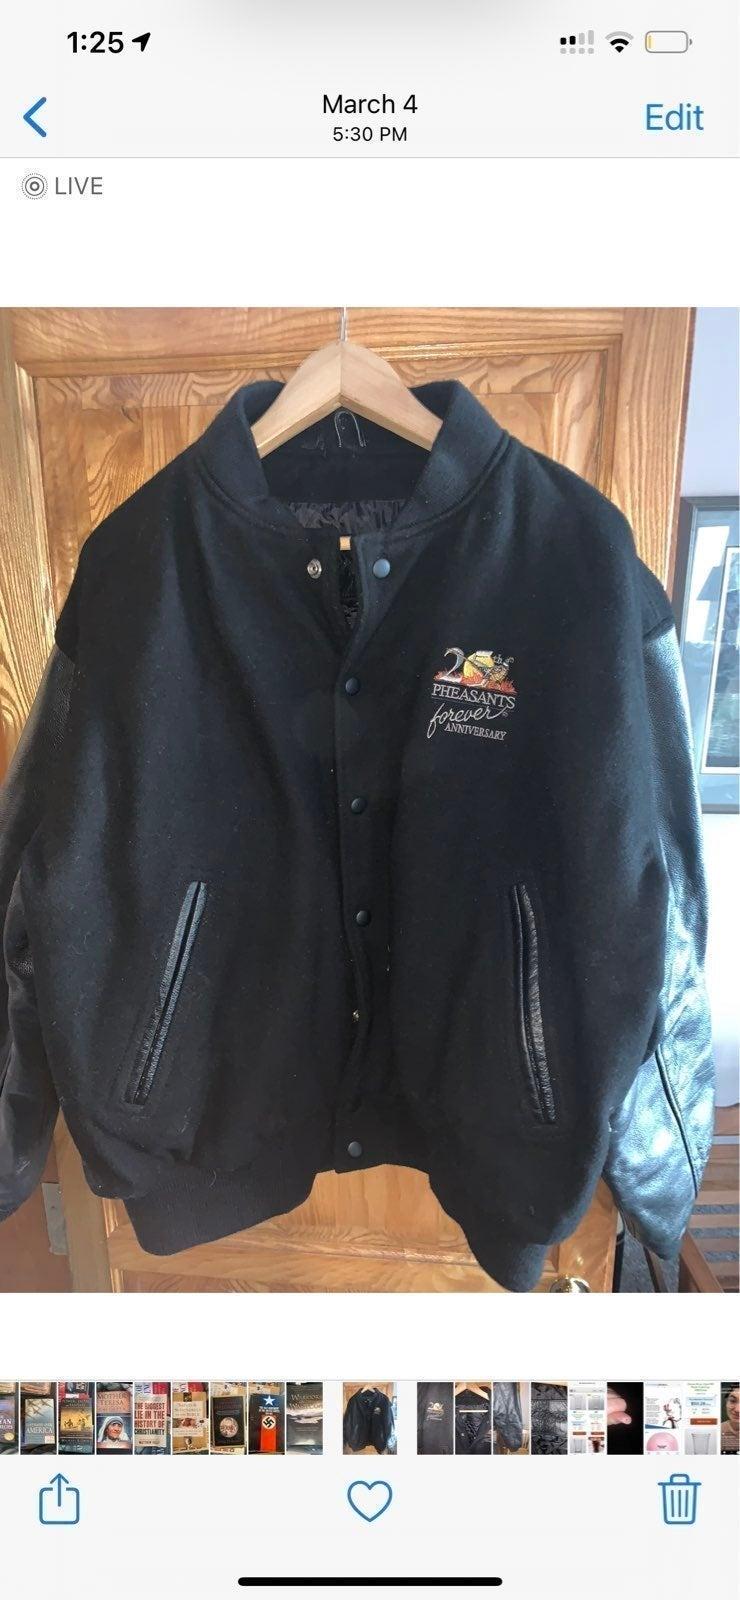 Pheasants Forever Jacket 25th Anniversar